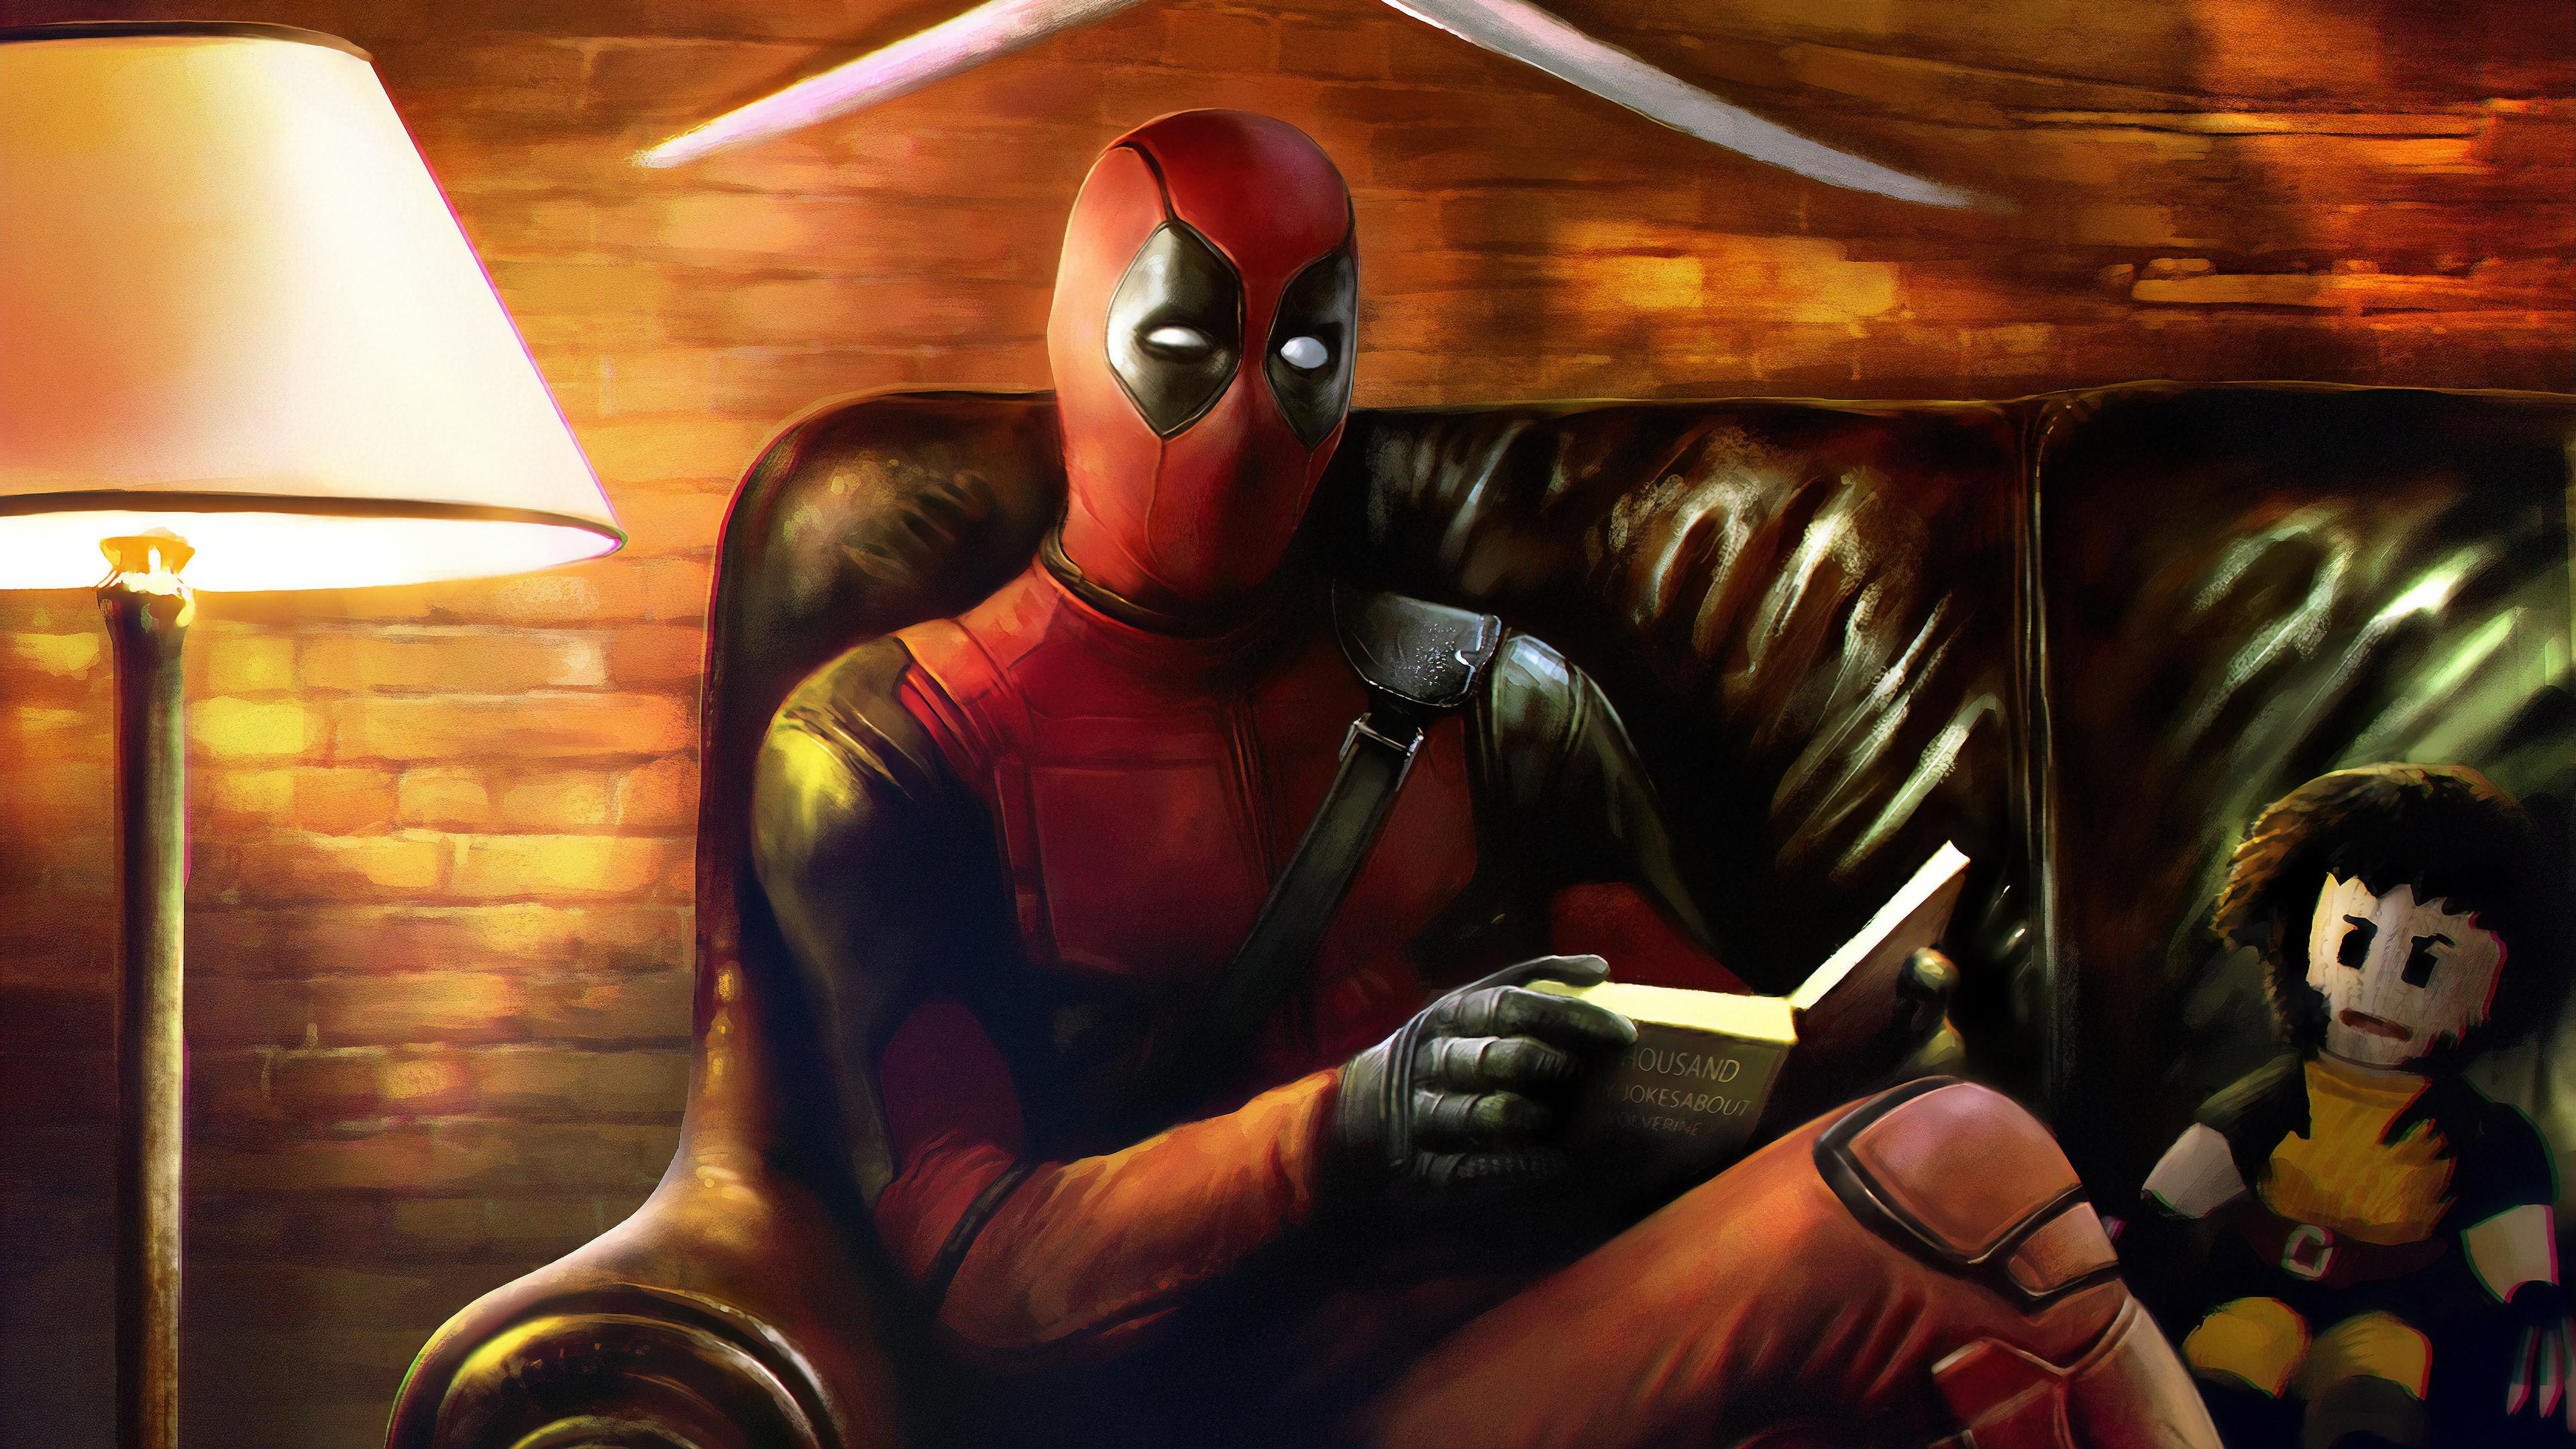 deadpool reading book 1560533733 - Deadpool Reading Book - superheroes wallpapers, hd-wallpapers, deviantart wallpapers, deadpool wallpapers, artwork wallpapers, 4k-wallpapers